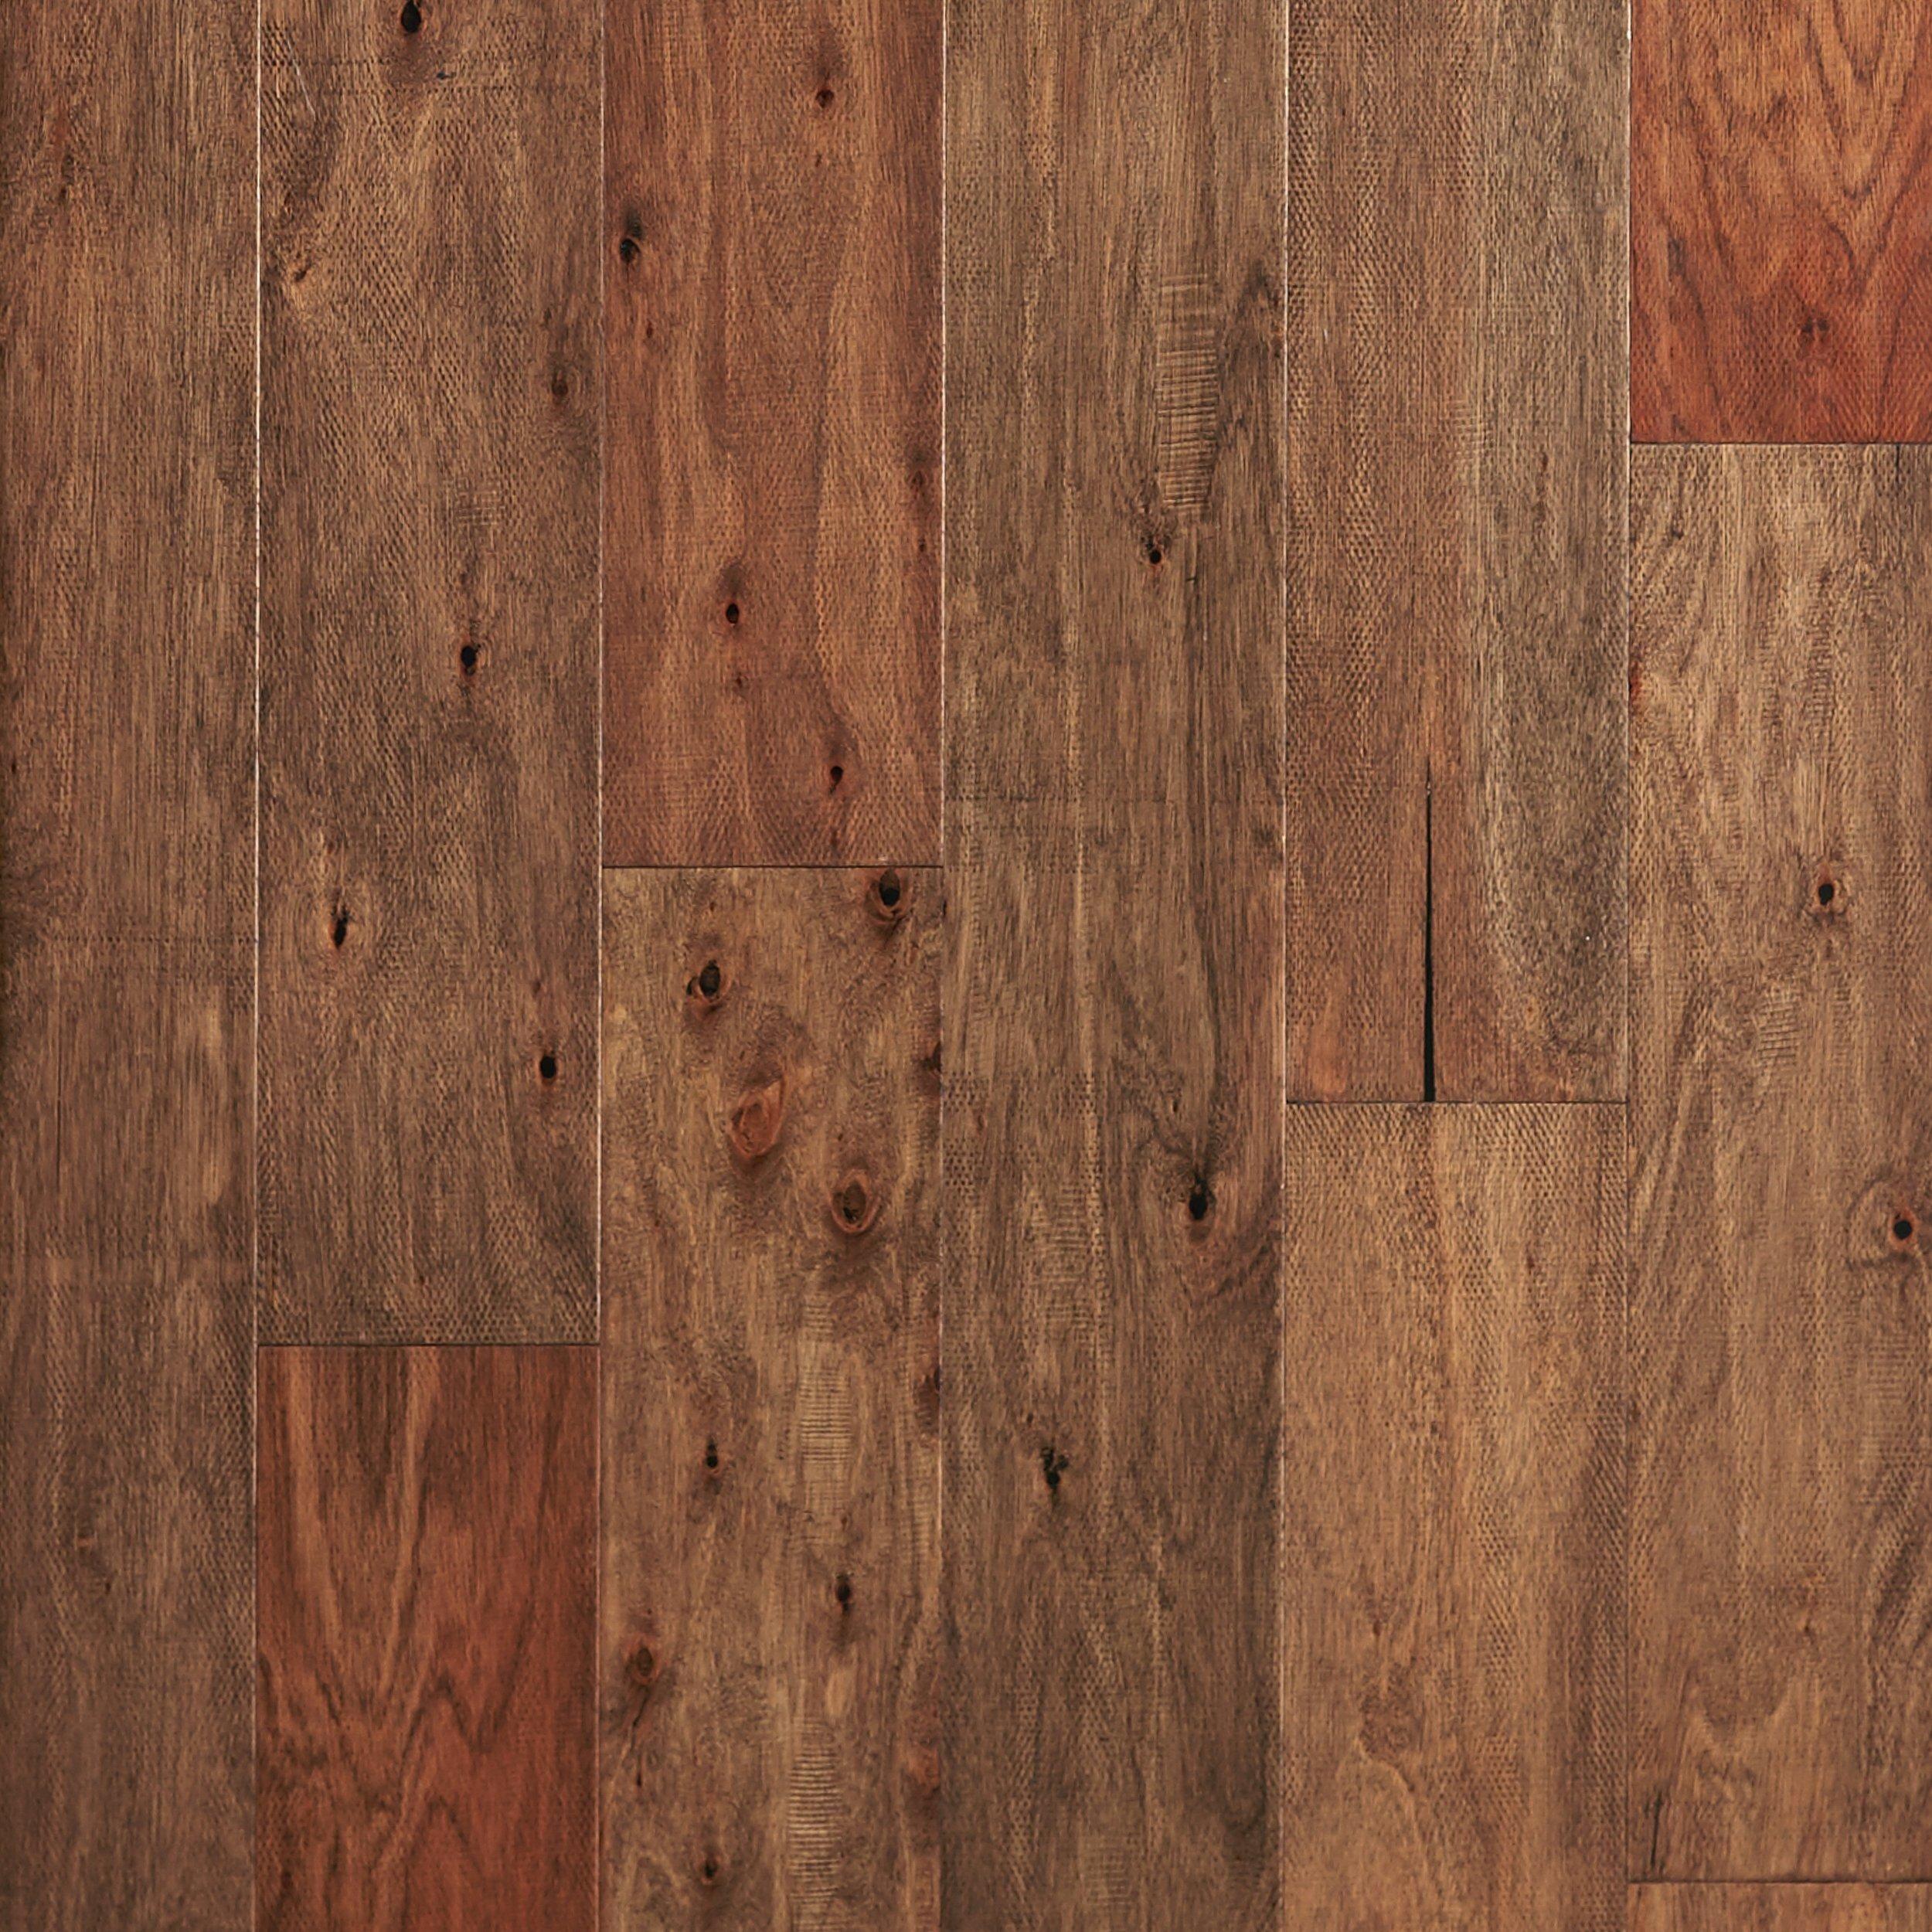 Driftwood Lyptus Hand Scraped Engineered Hardwood Floor Decor In 2020 Wood Floors Wide Plank Engineered Hardwood Engineered Wood Floors